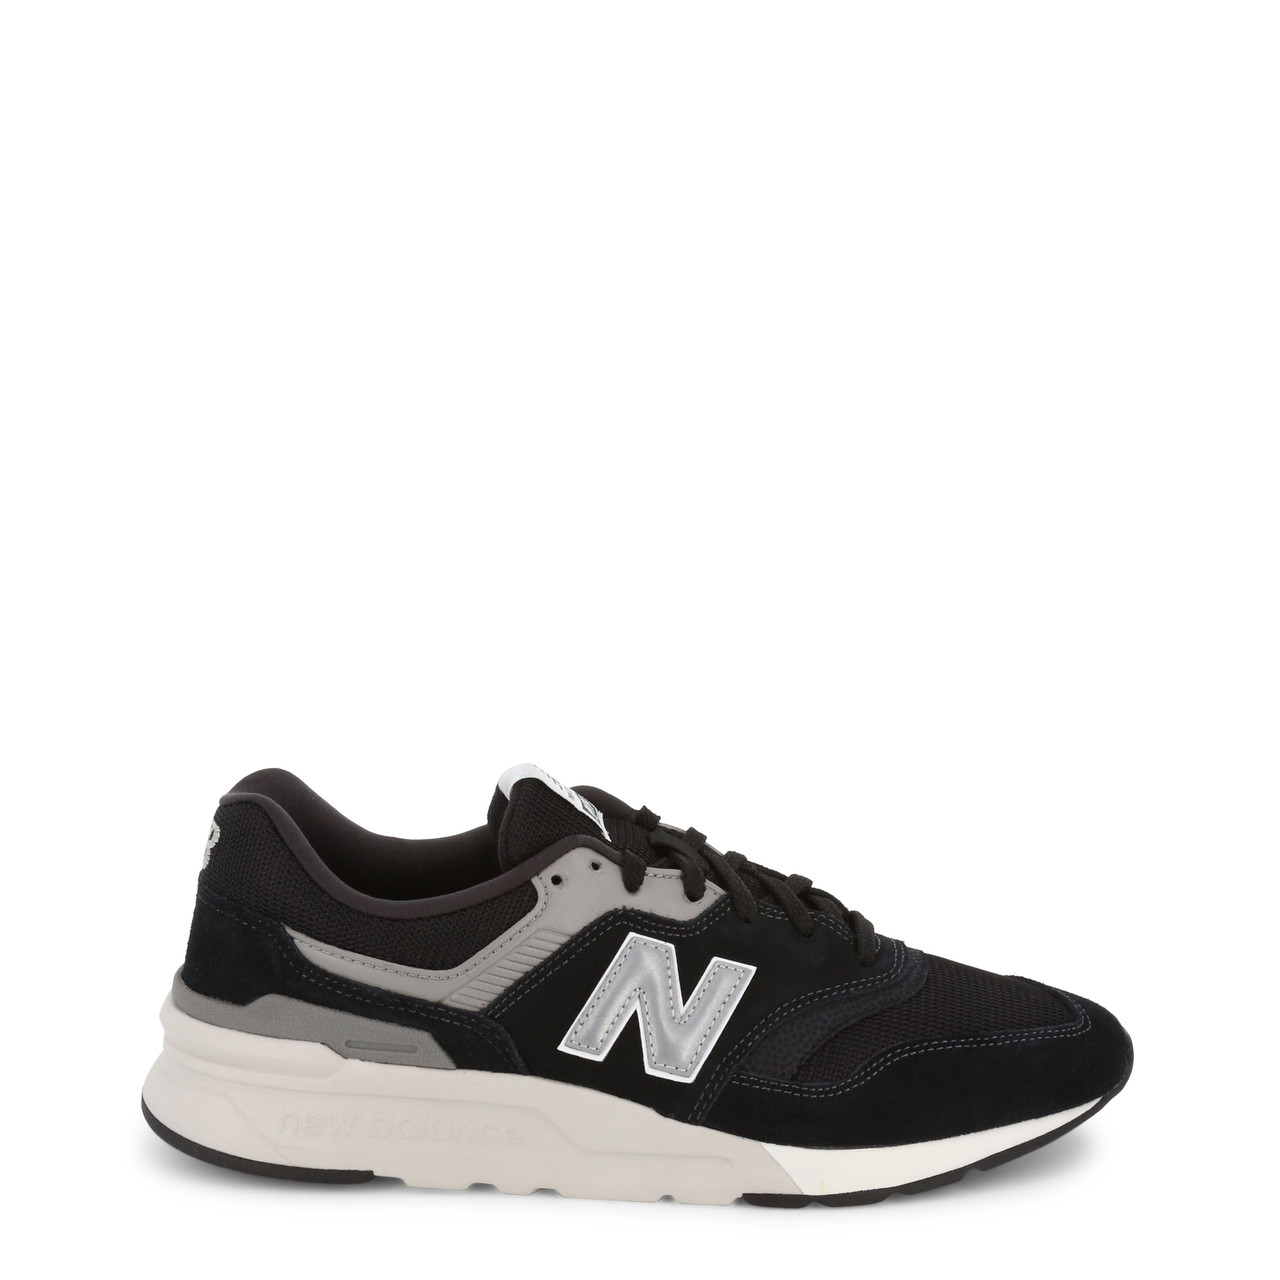 new balance cm997 black